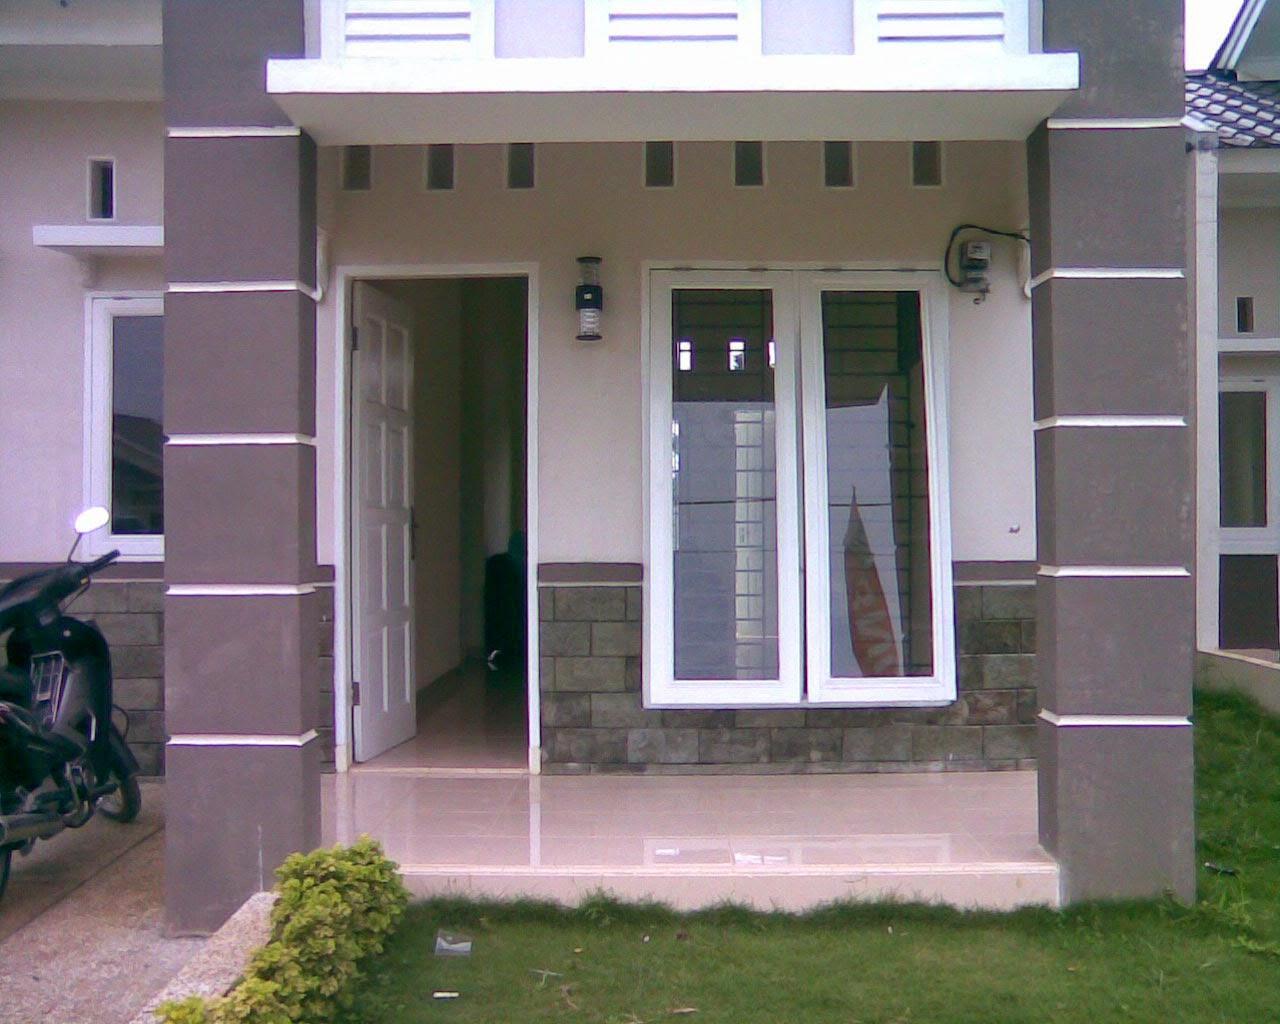 Pole-Terrace-House-To-House-Minimalist